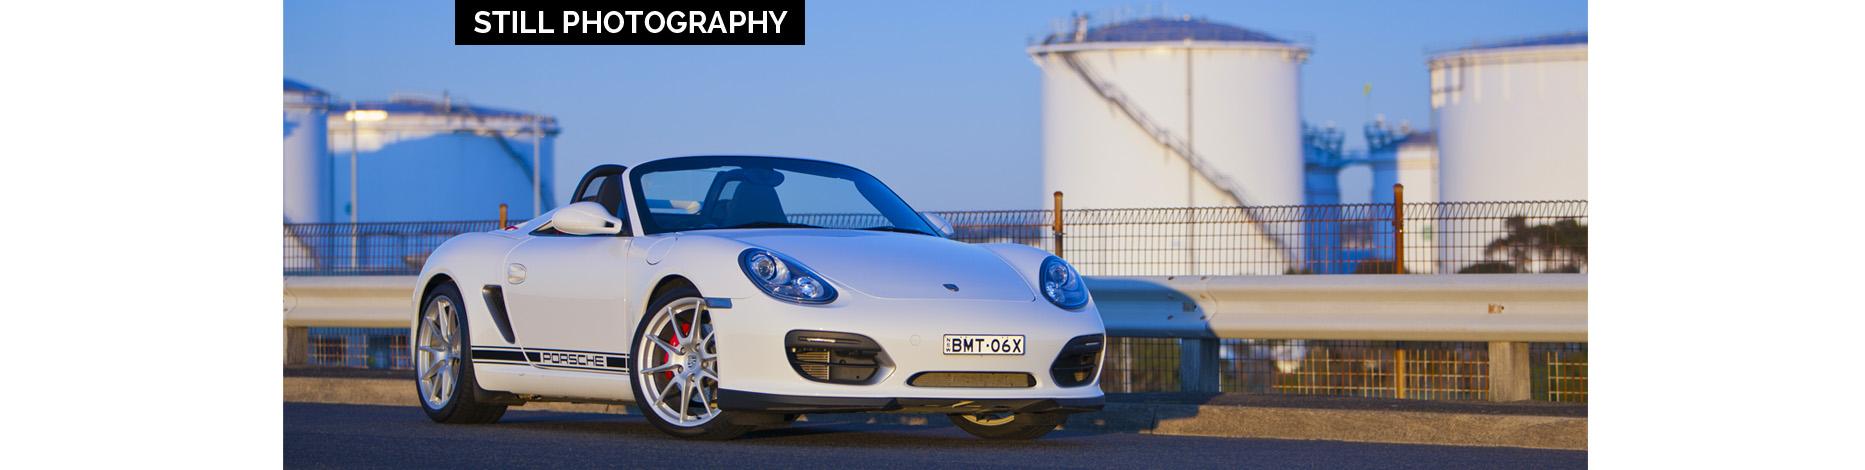 CAR PHOTOGRAPHER AUSTRALIA.jpg